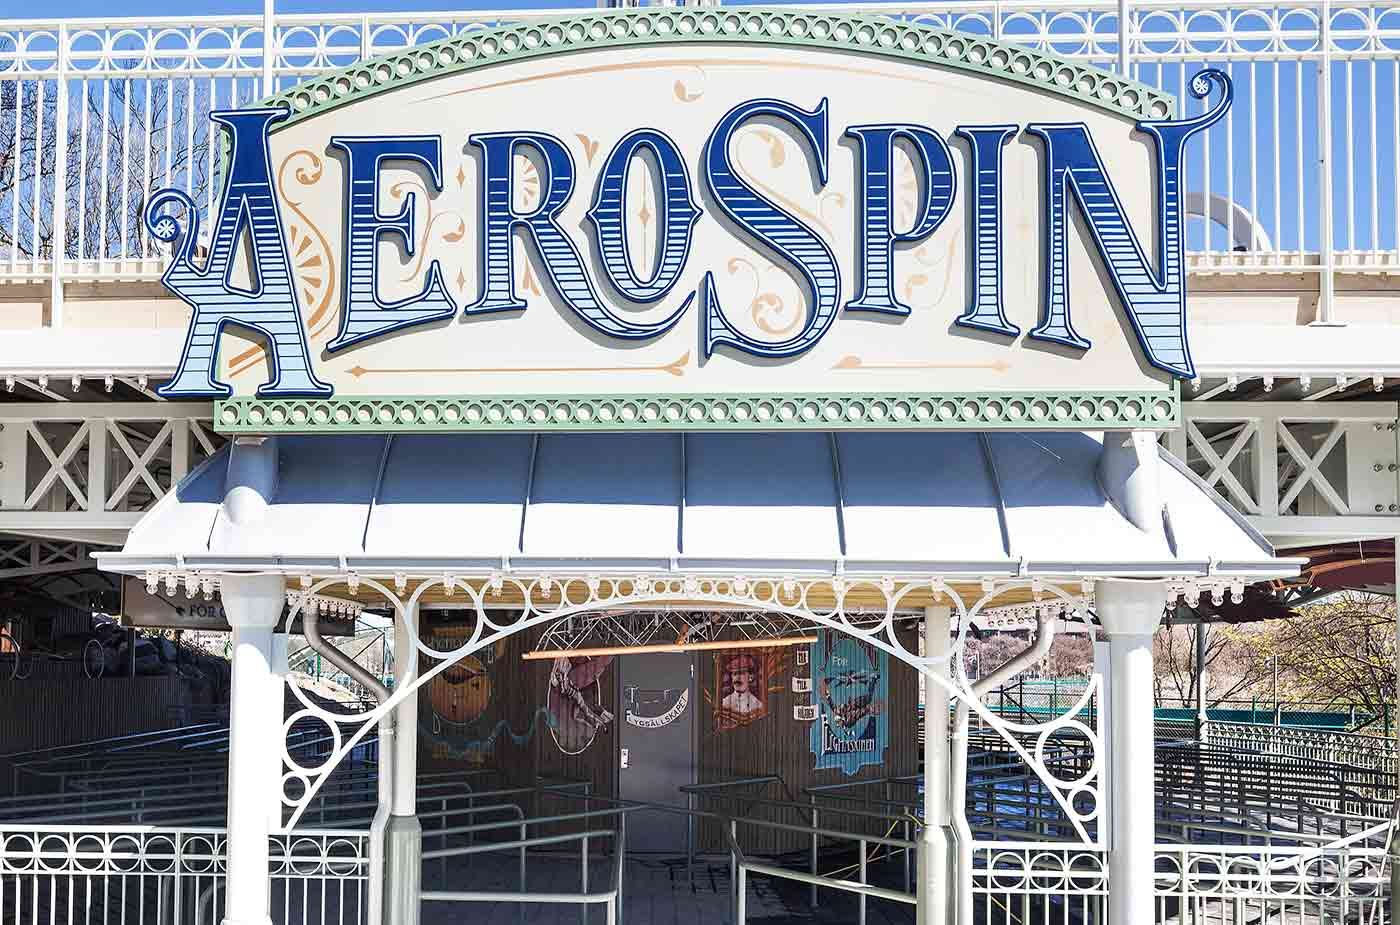 Aeorospin, Liseberg